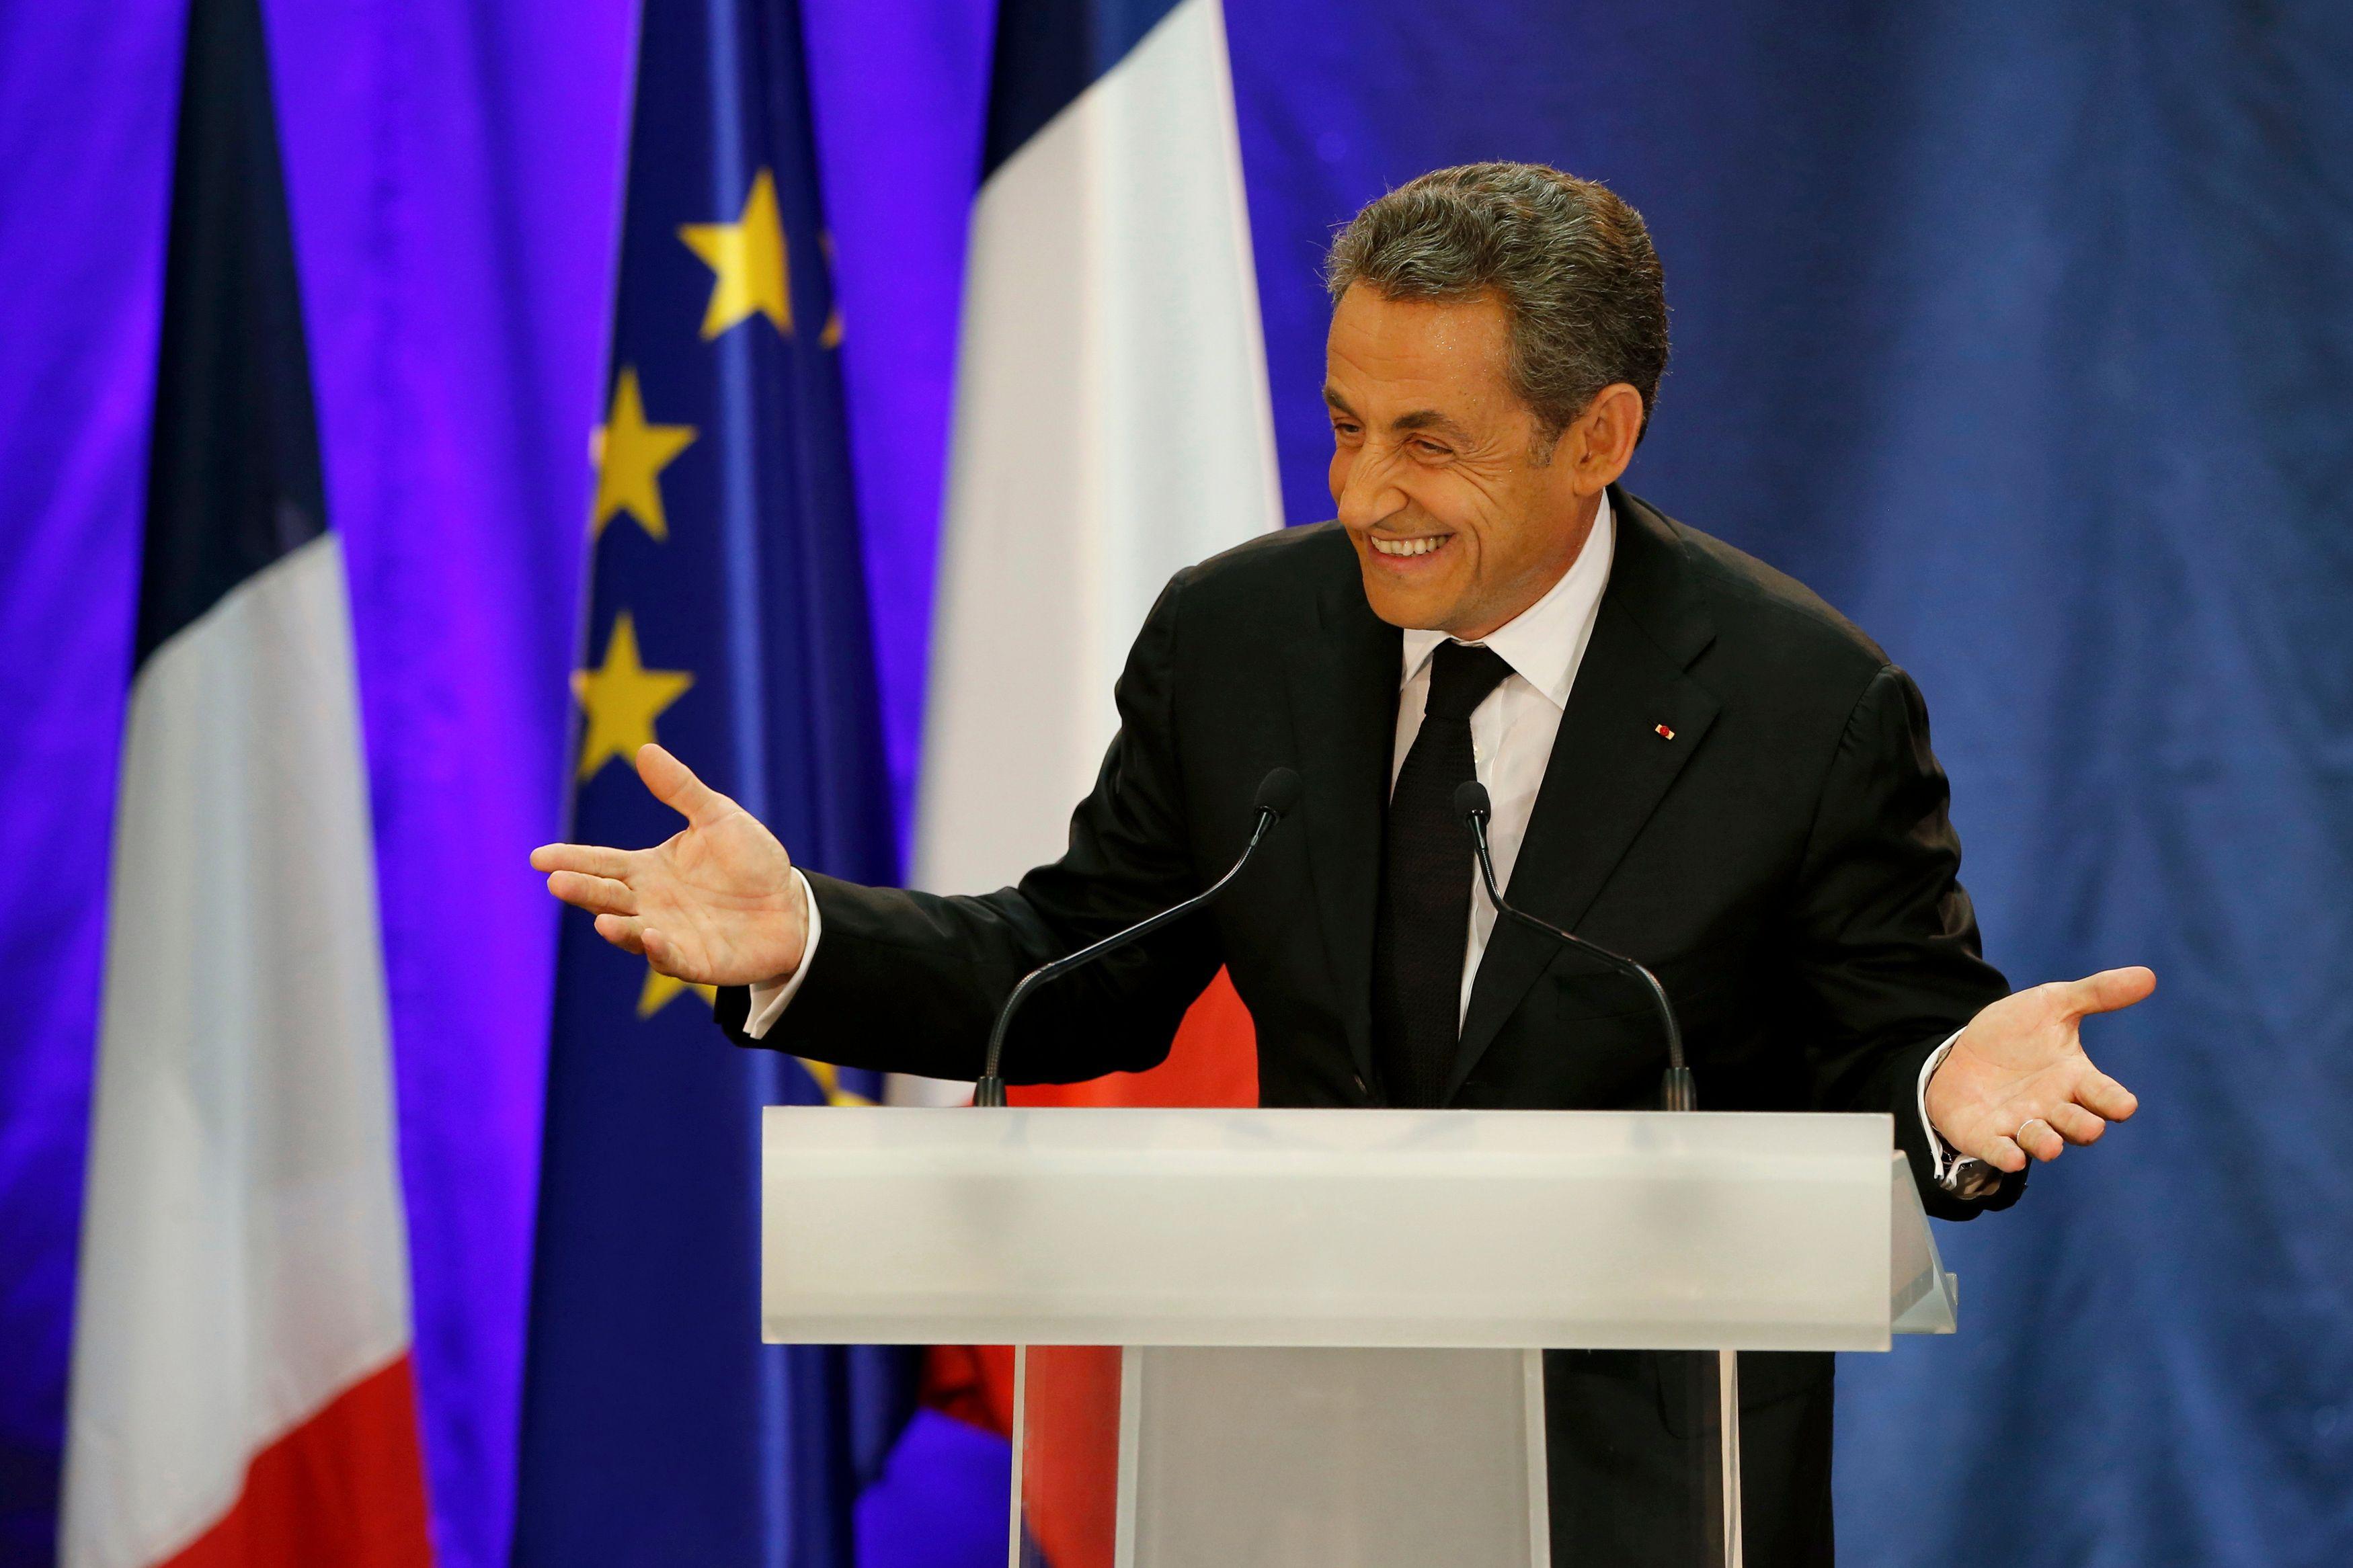 Nicolas Sarkozy a tenu 19 réunions publiques lors de la campagne